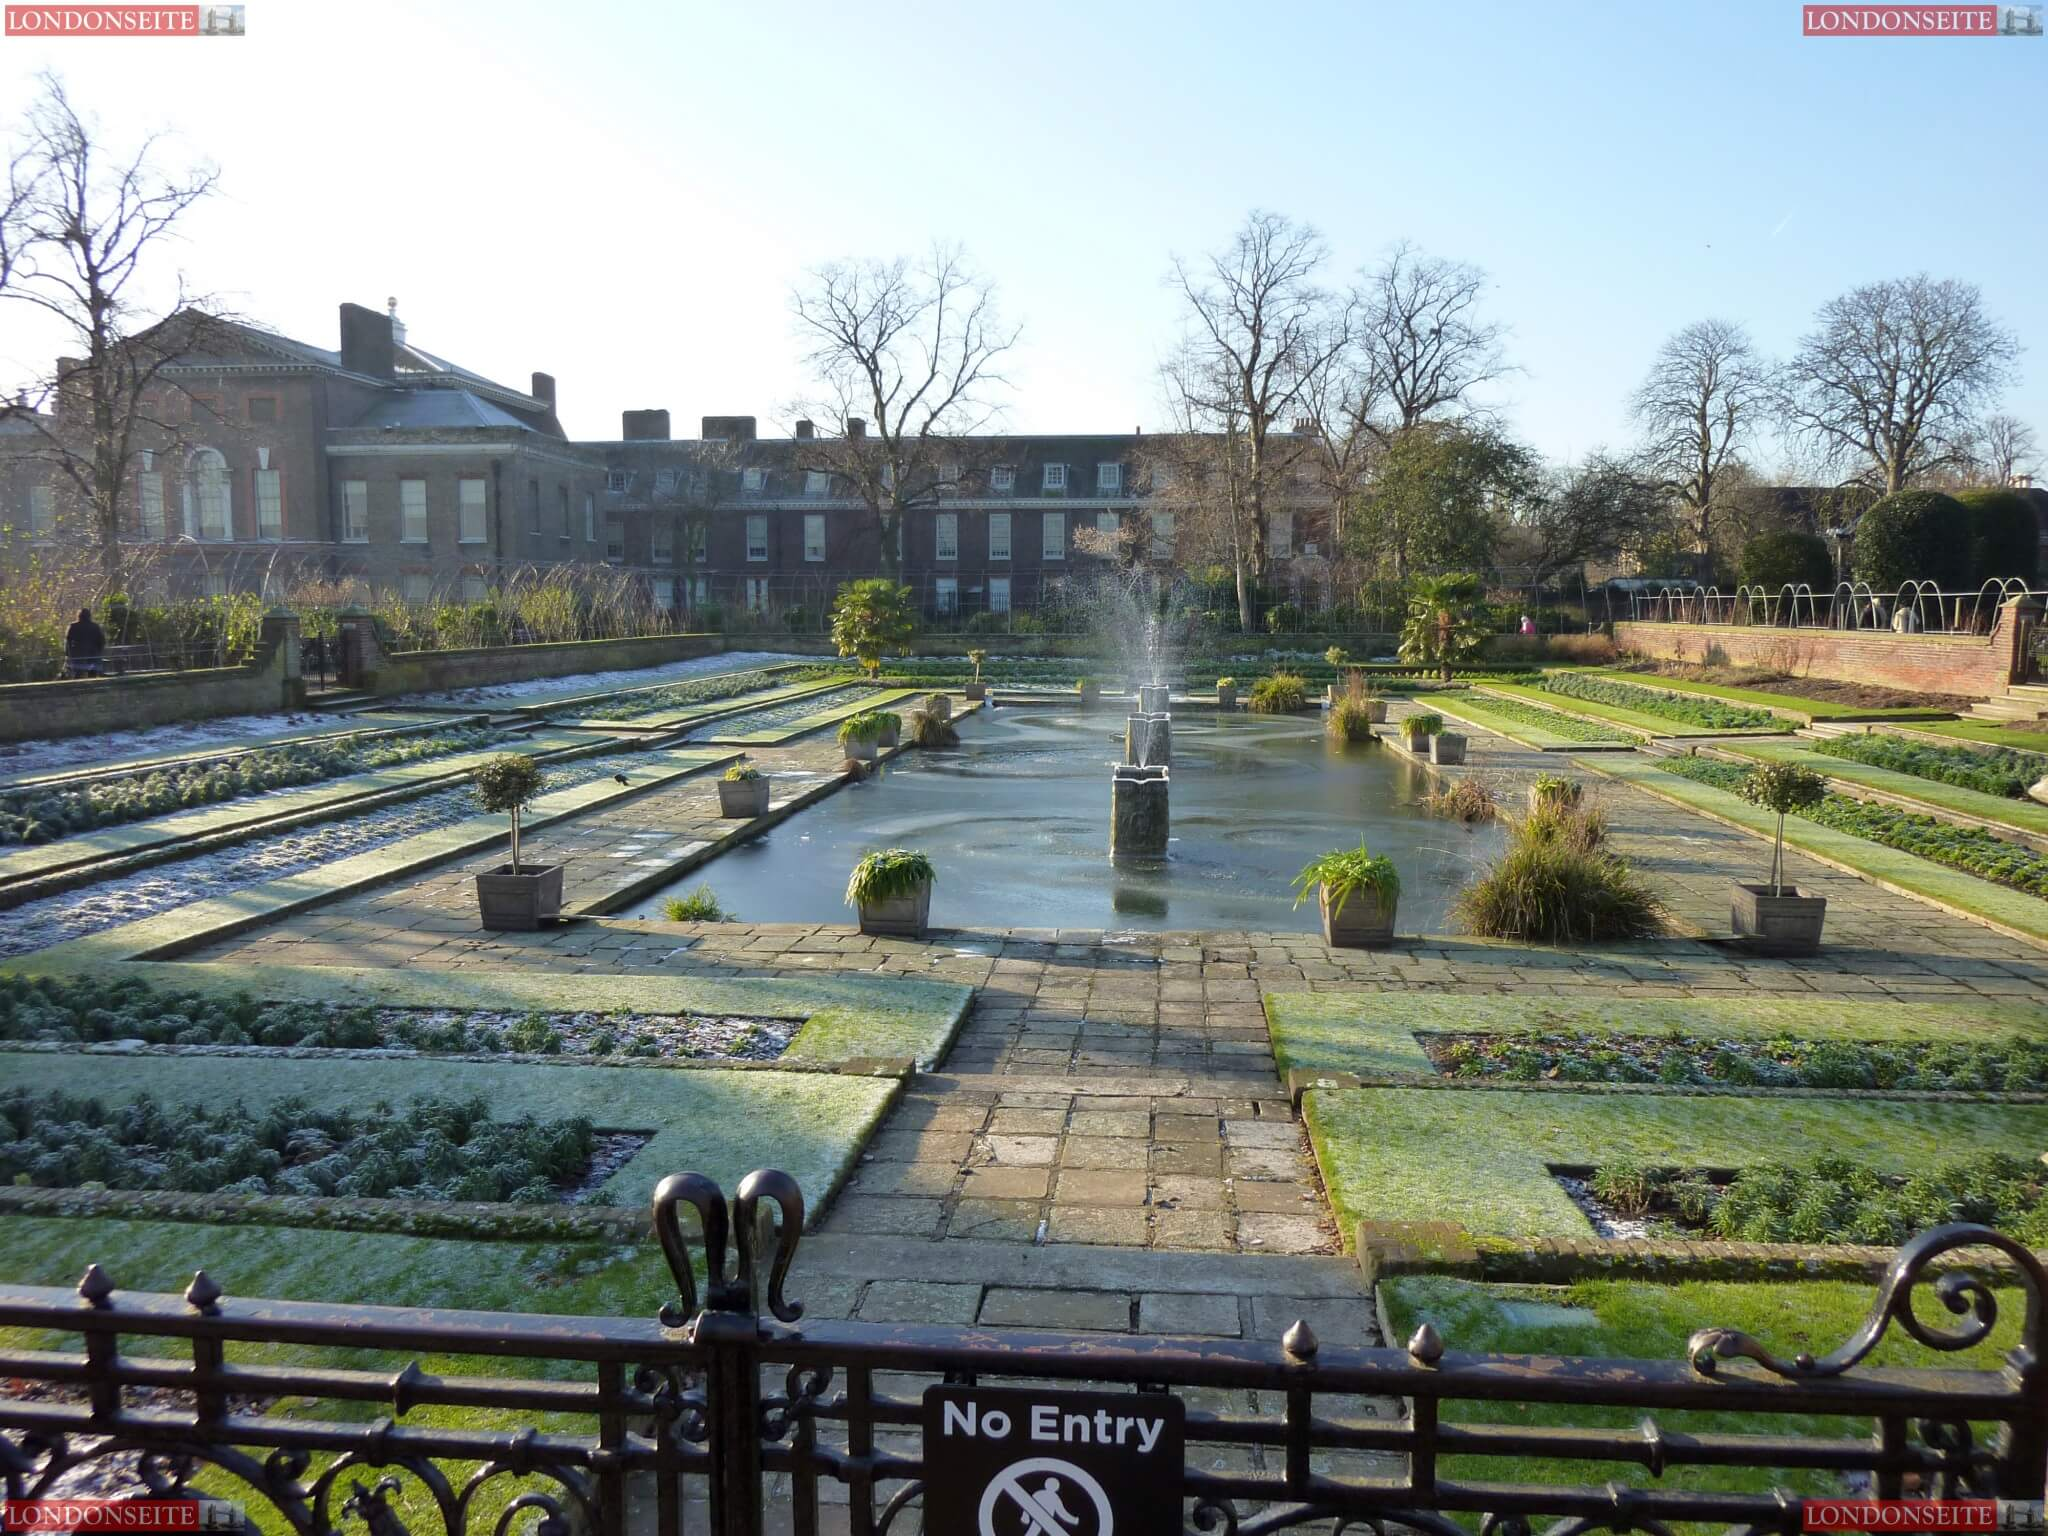 Kensignton Palace